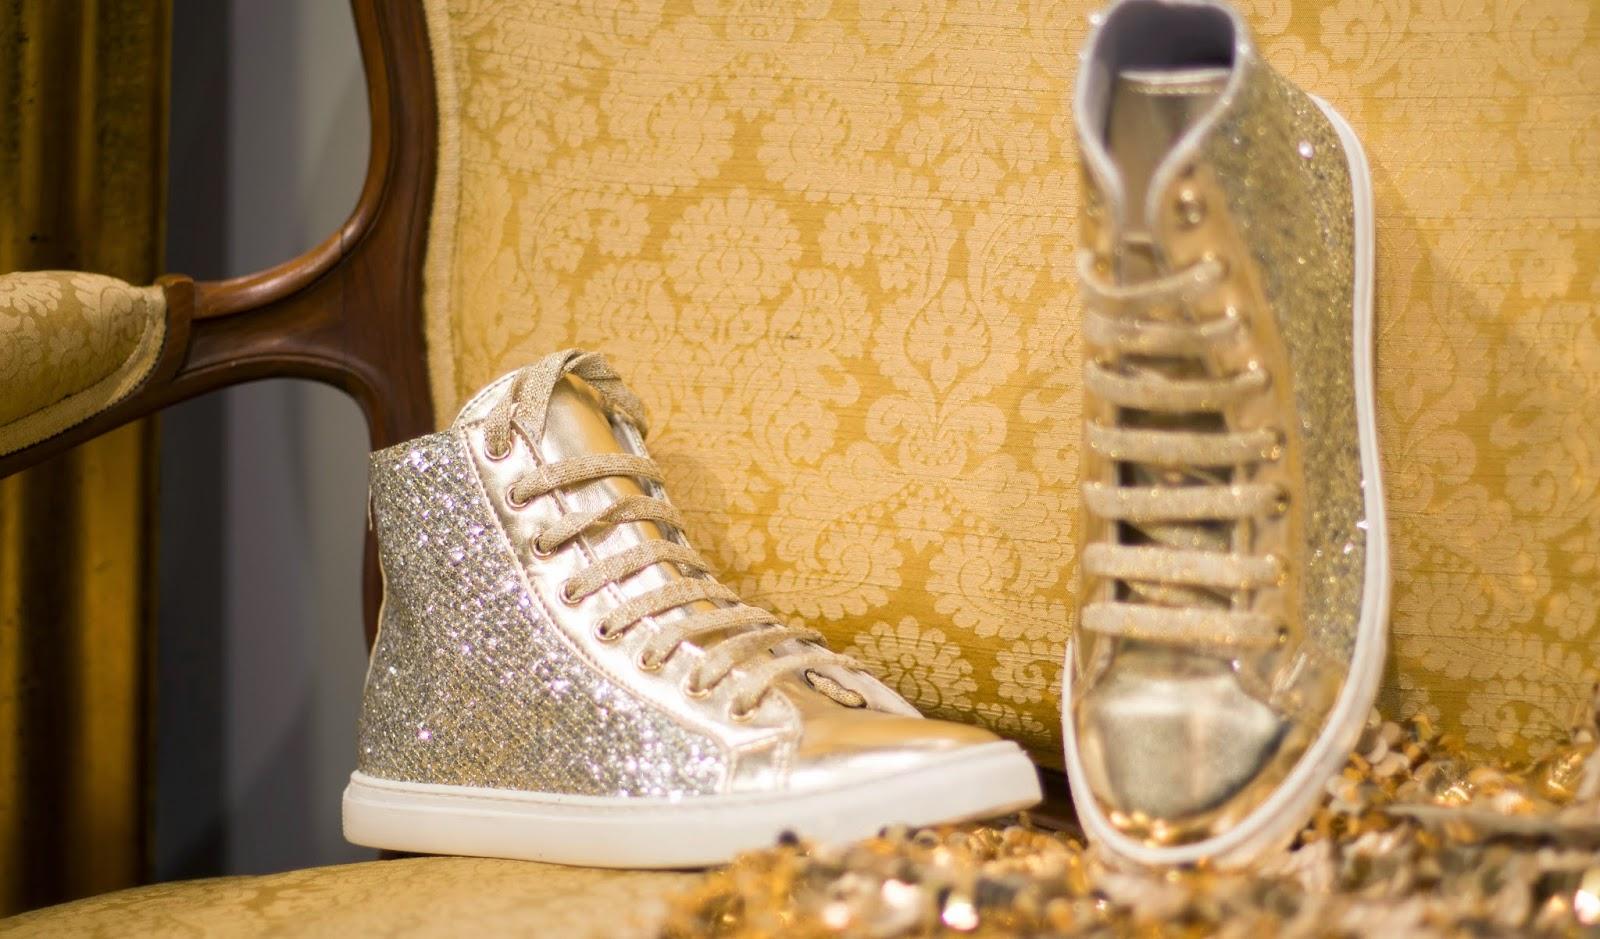 bruidssneakers - sneakers voor de bruid